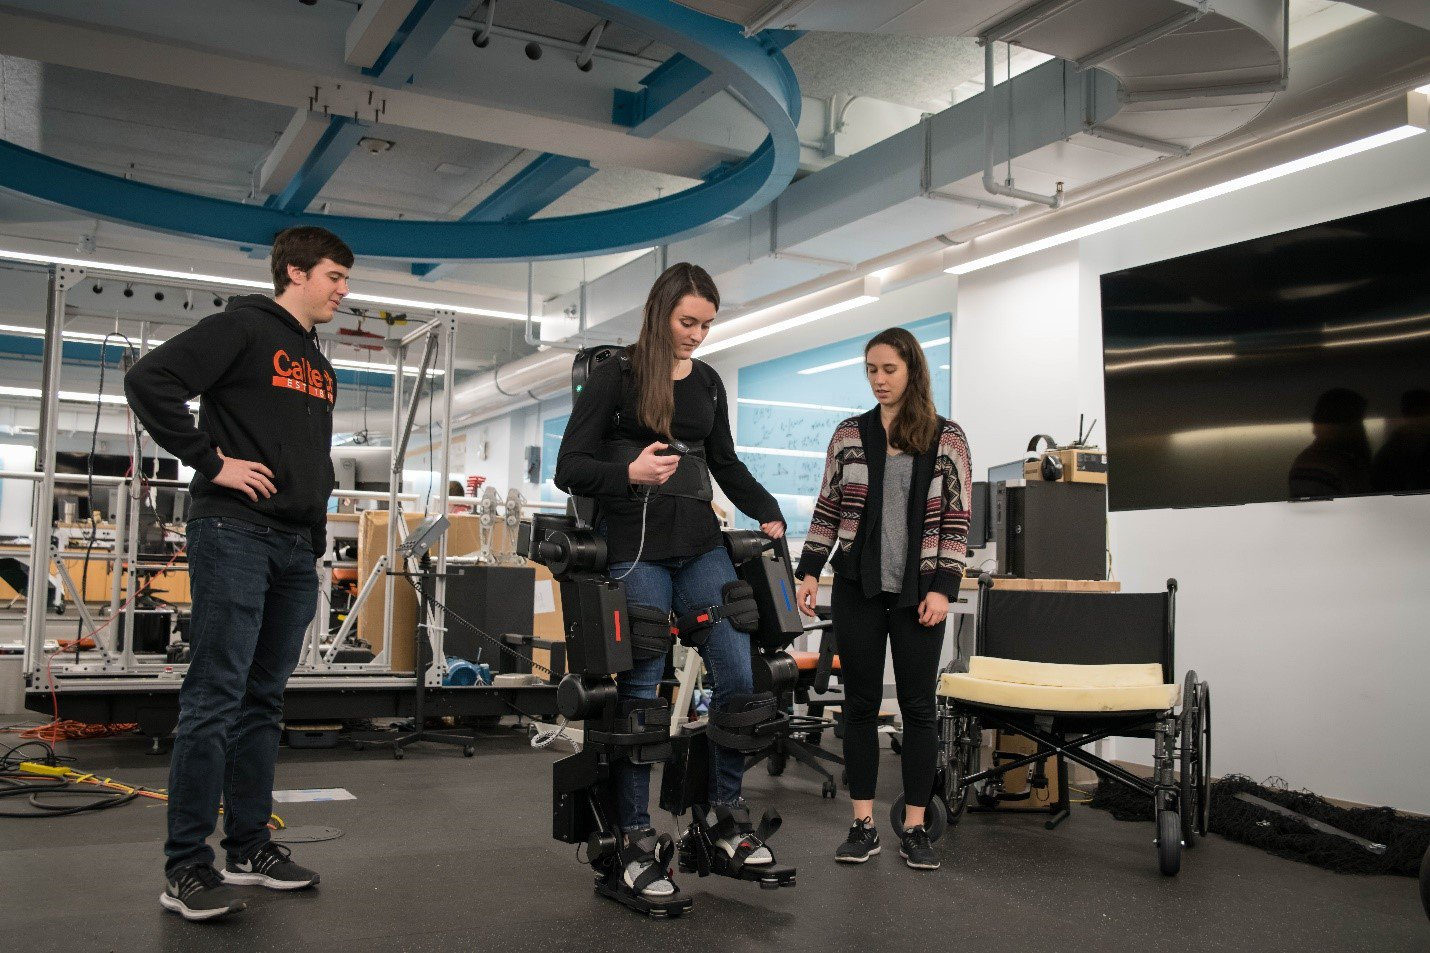 Maegan (center) testing the responsiveness of an exoskeleton.